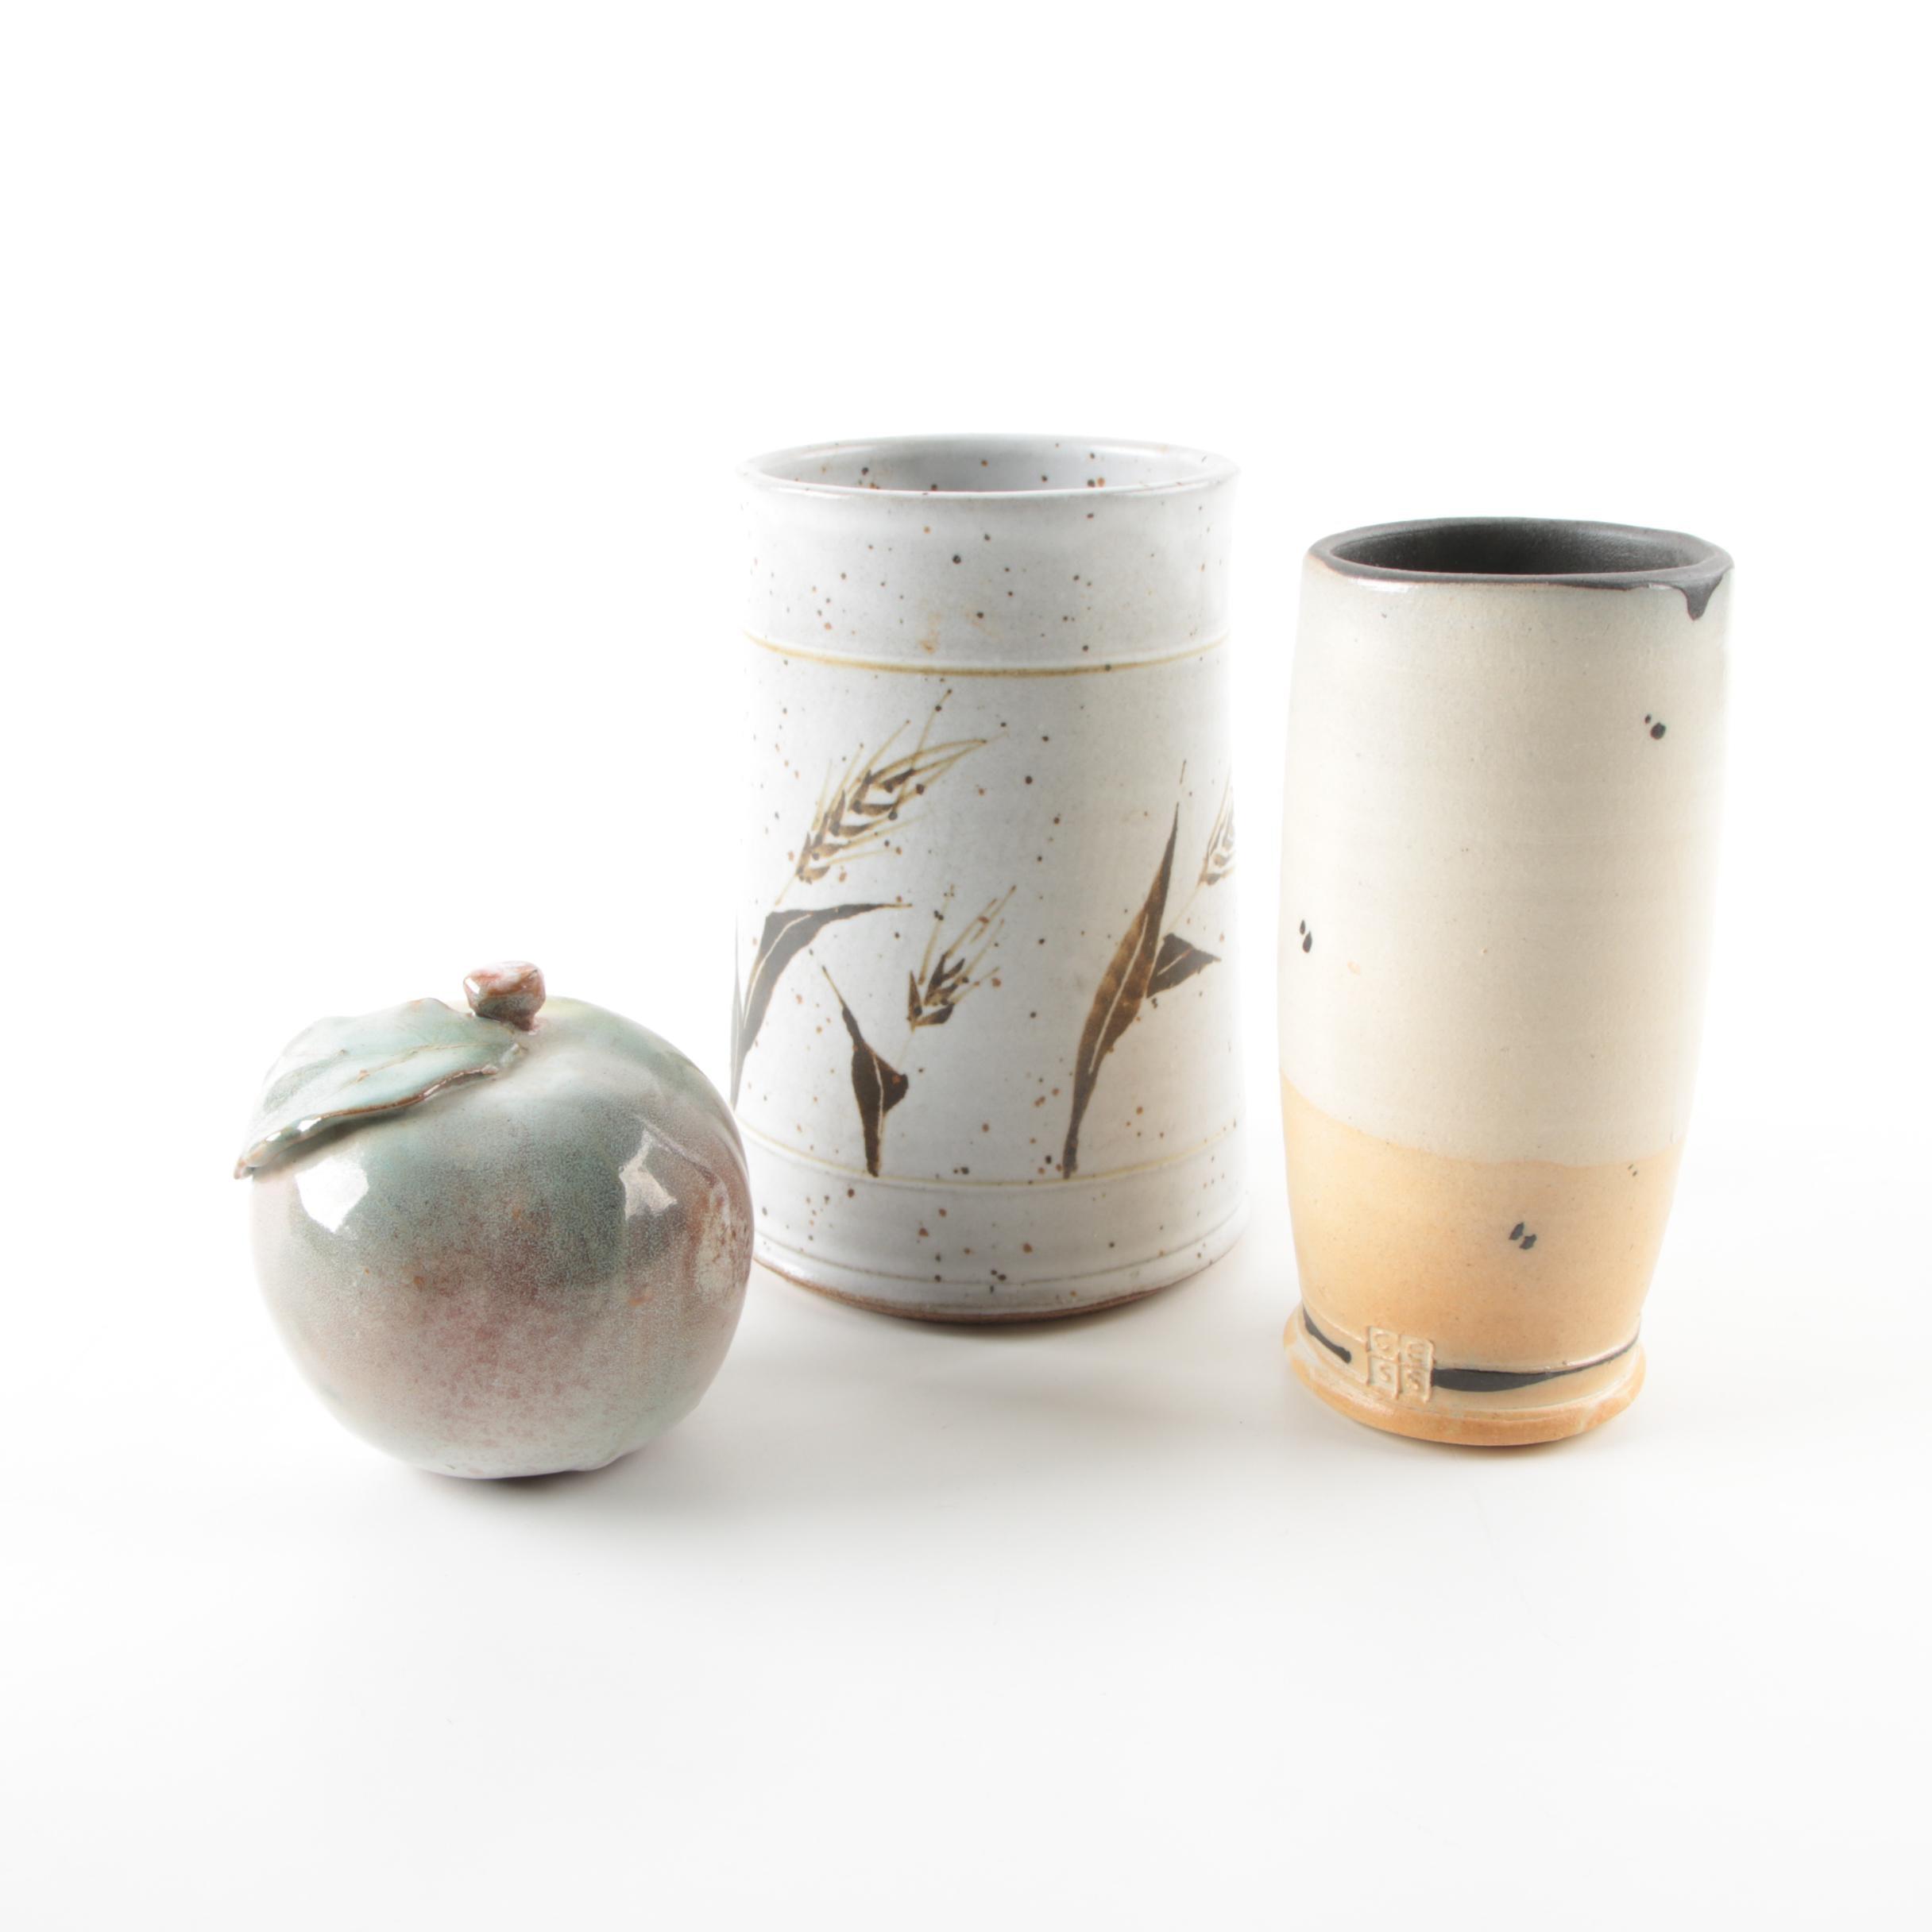 Hand-Thrown Stoneware Vases and Apple Figurine